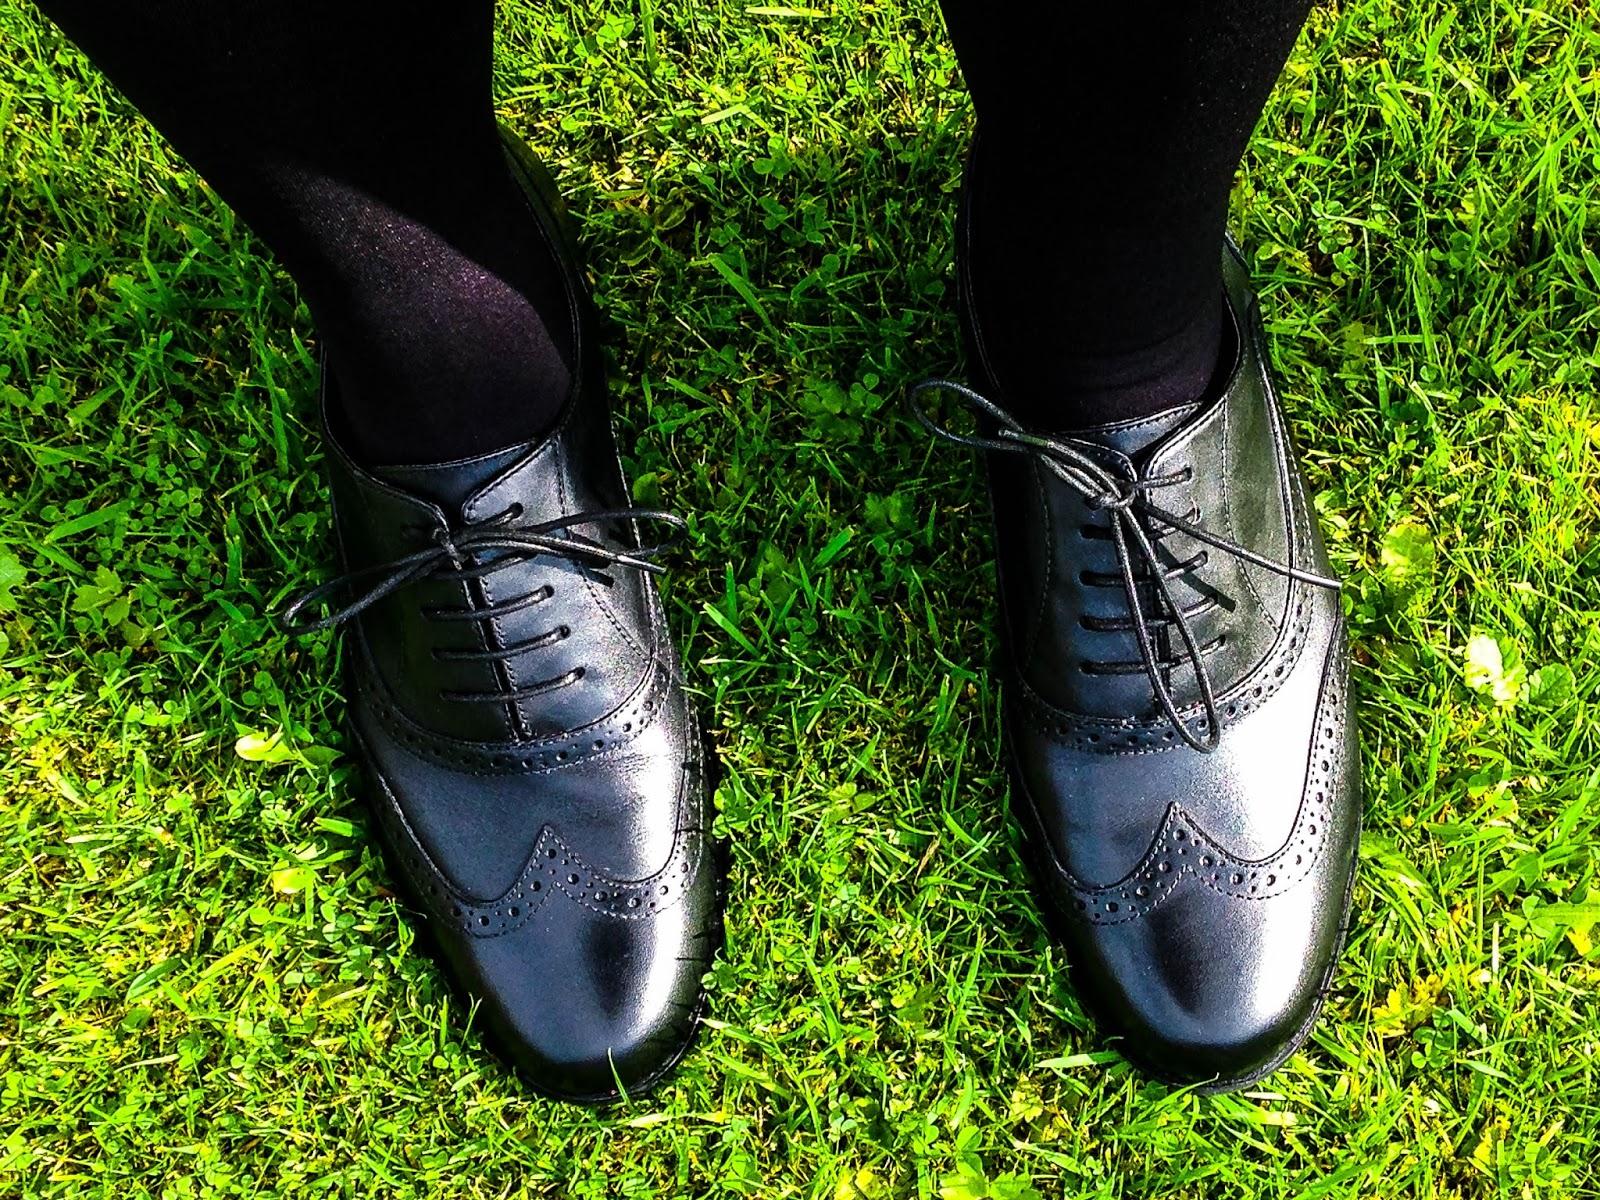 clarks hamble oak black leather womens shoes innovaide. Black Bedroom Furniture Sets. Home Design Ideas